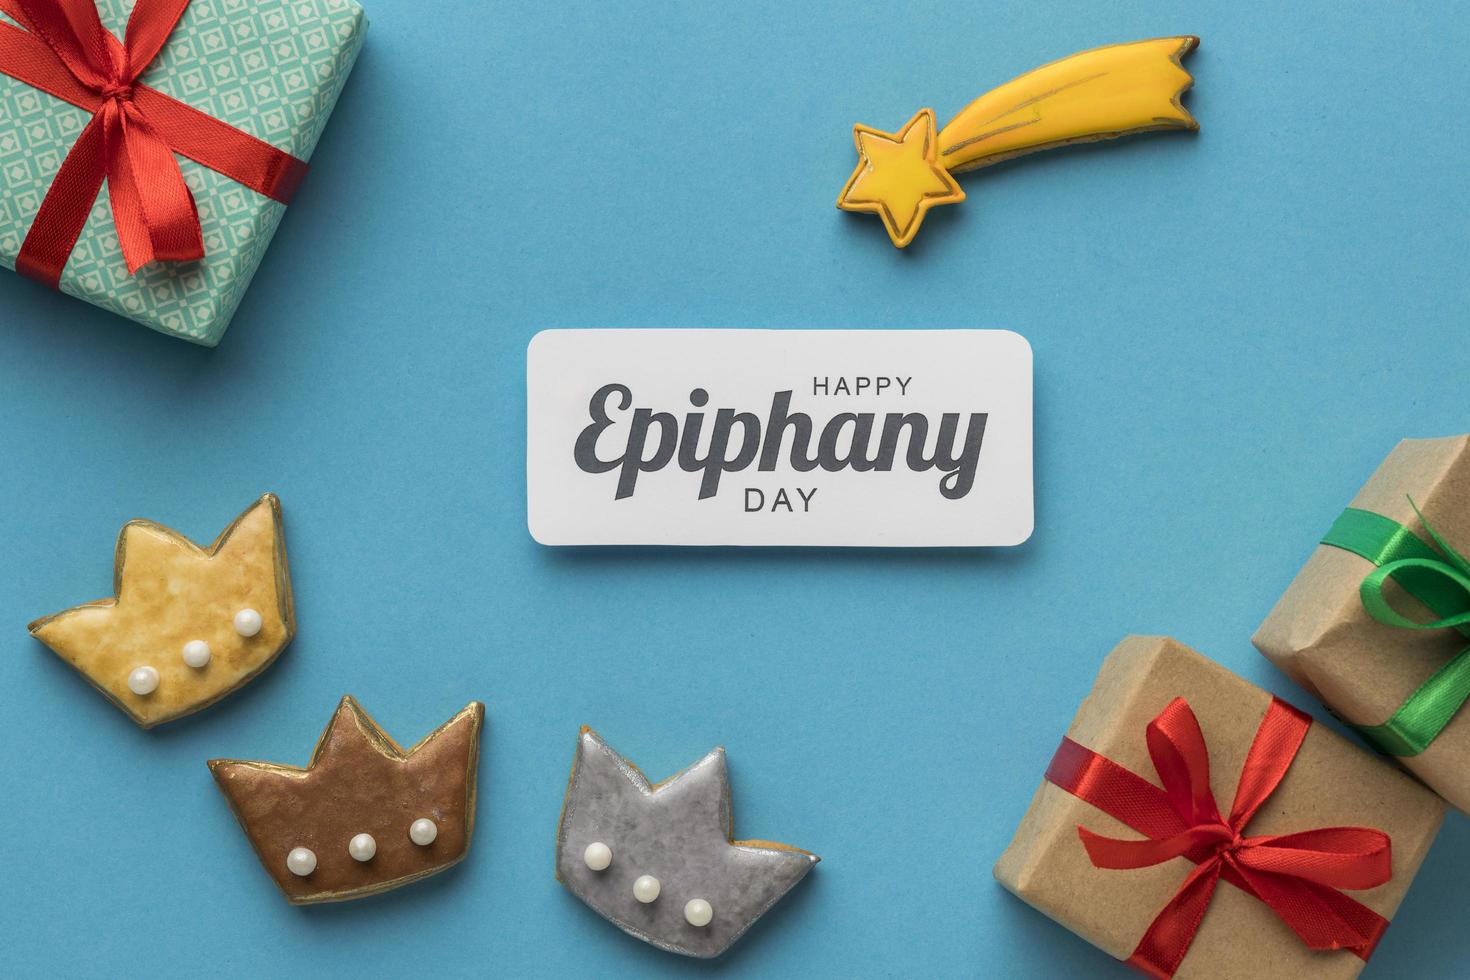 epiphany day cookies en cadeautjes foto